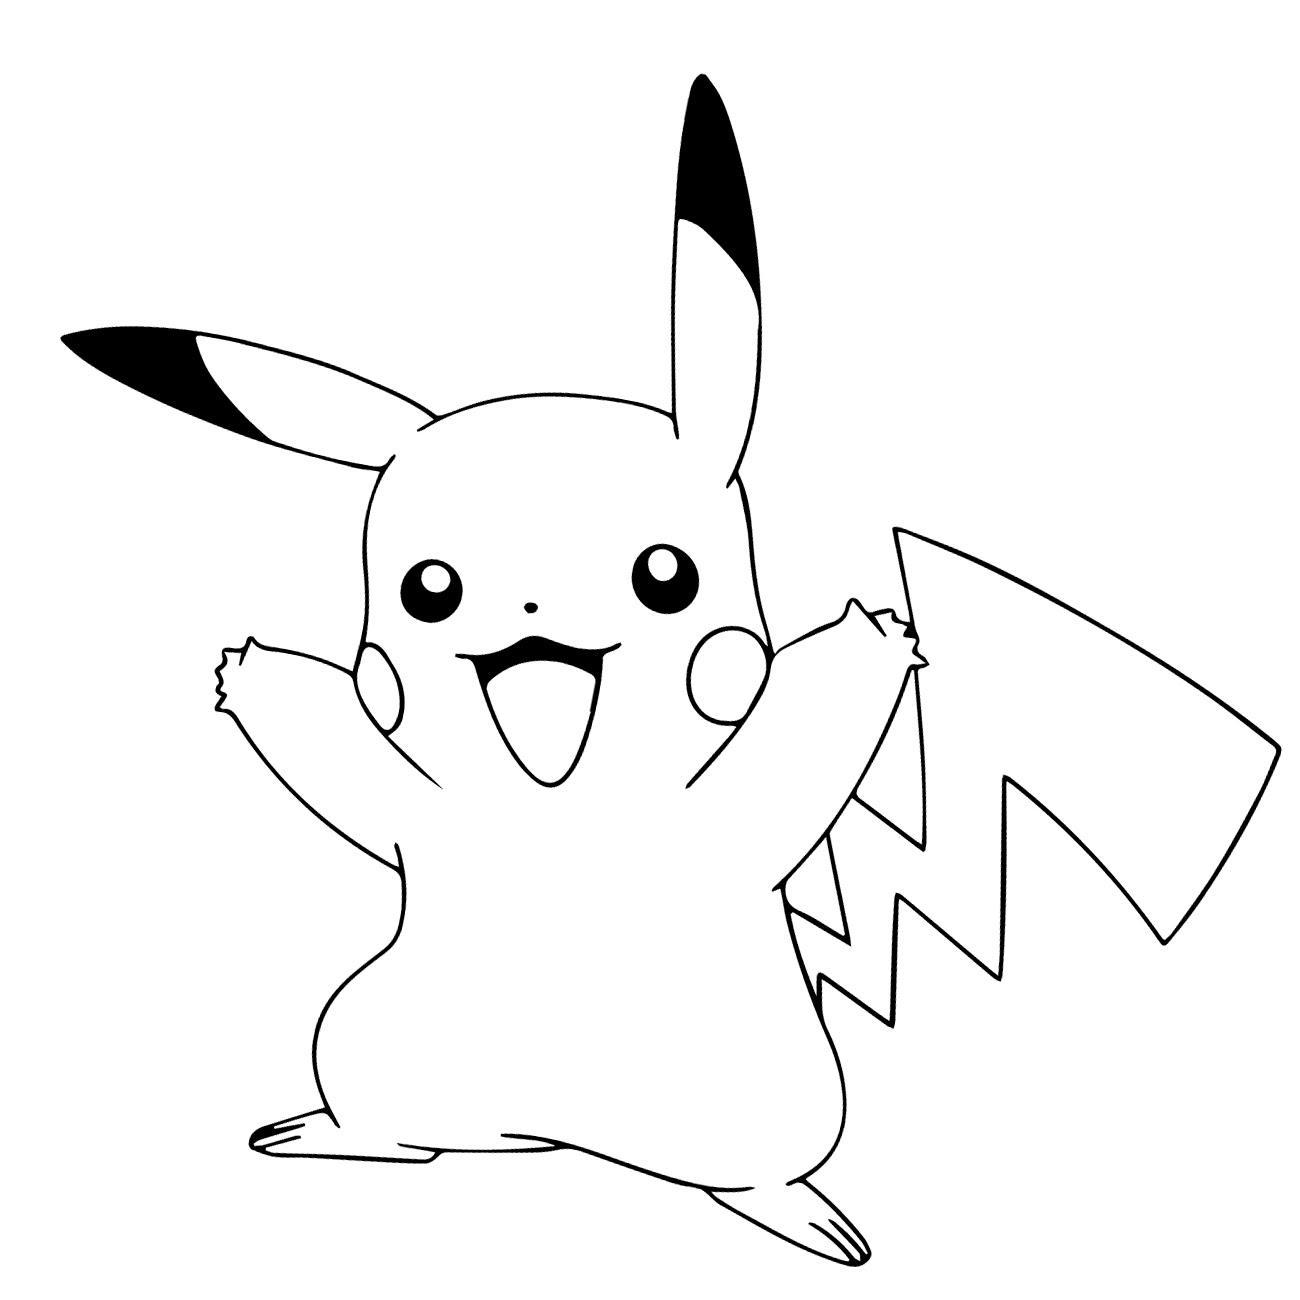 Dibujos Para Colorear De Pikachu Para Imprimir Imagesacolorierwebsite